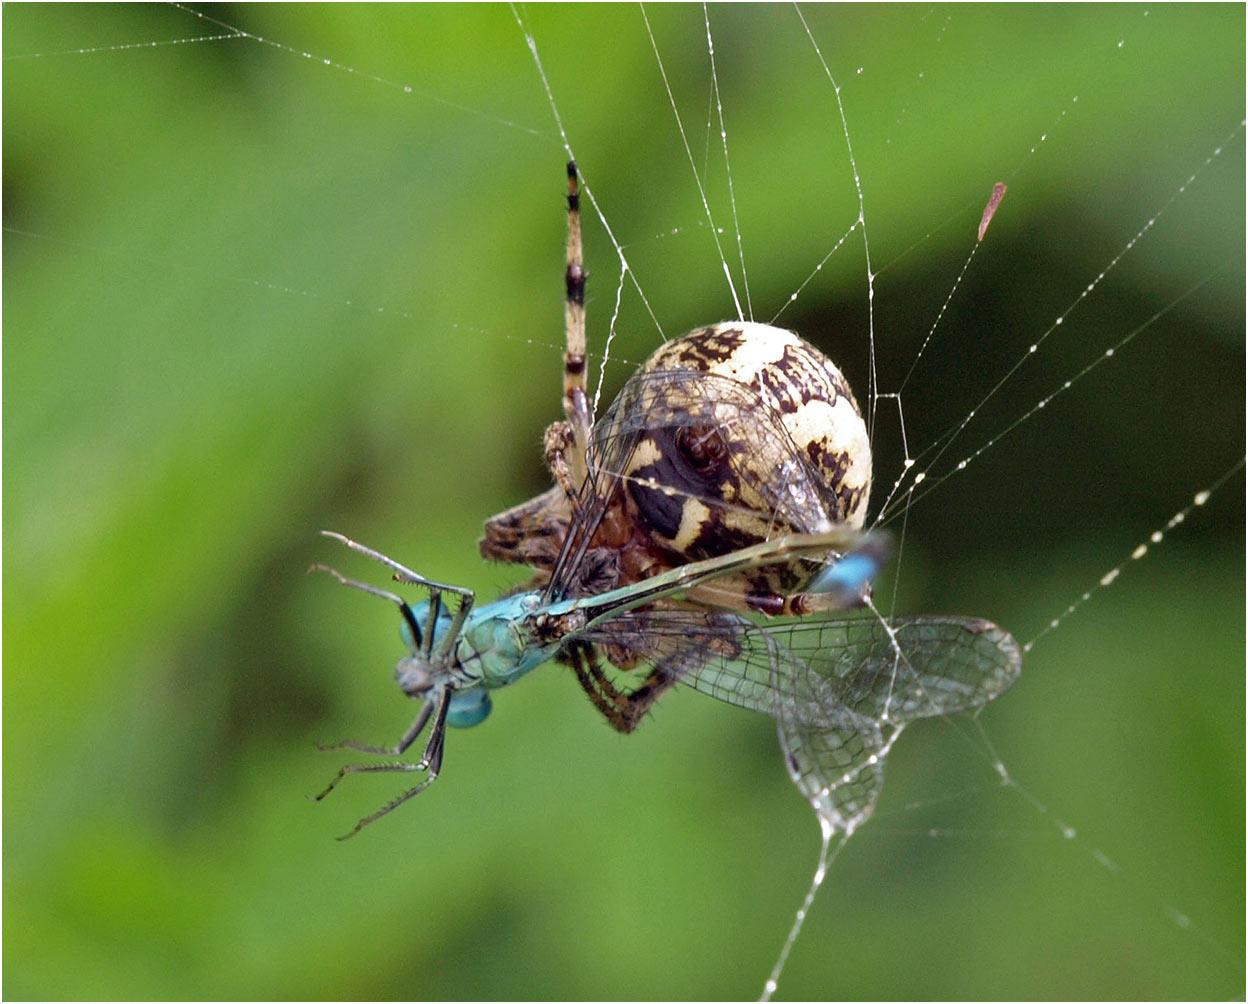 Prédation Larinoides cornutus sur Ischnura elegans mâle, Beaupréau (France - 49), 15/08/2007